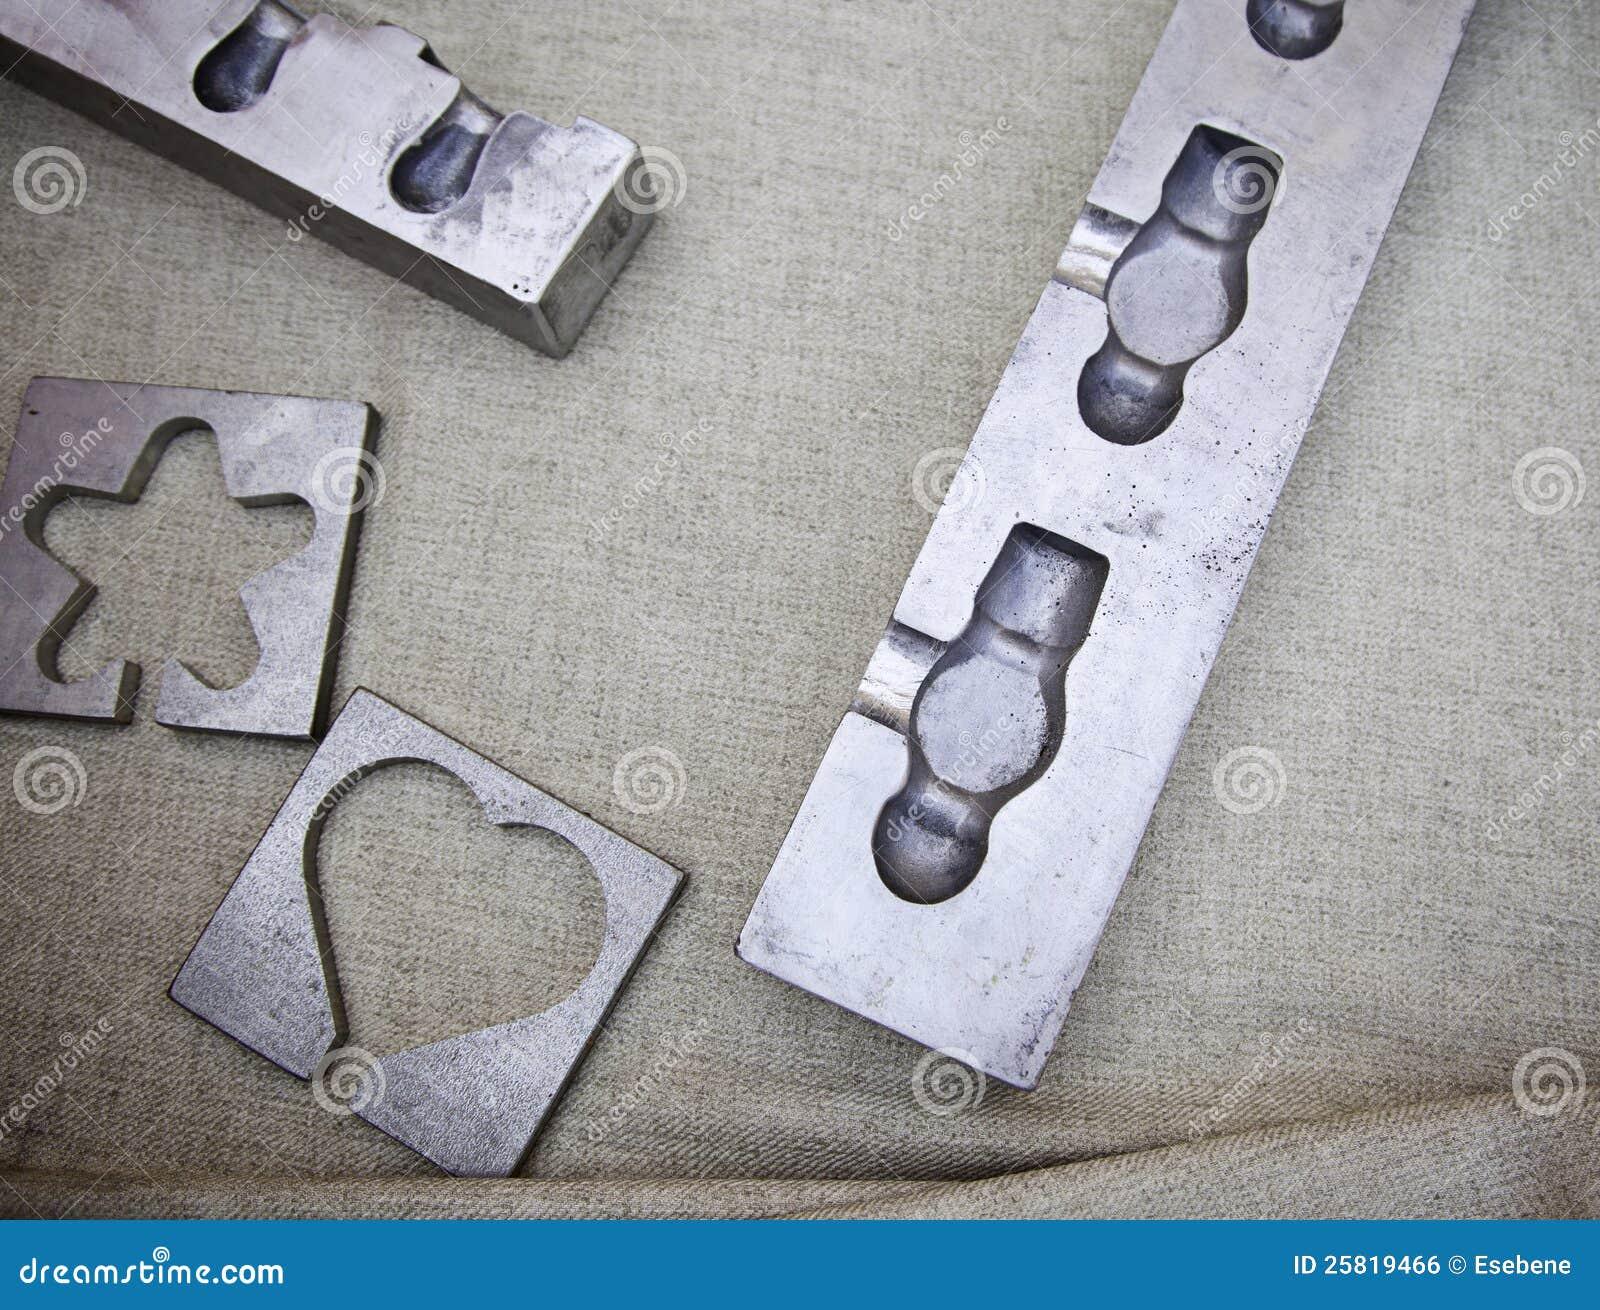 Steel Brick Mold : Metal molds royalty free stock image